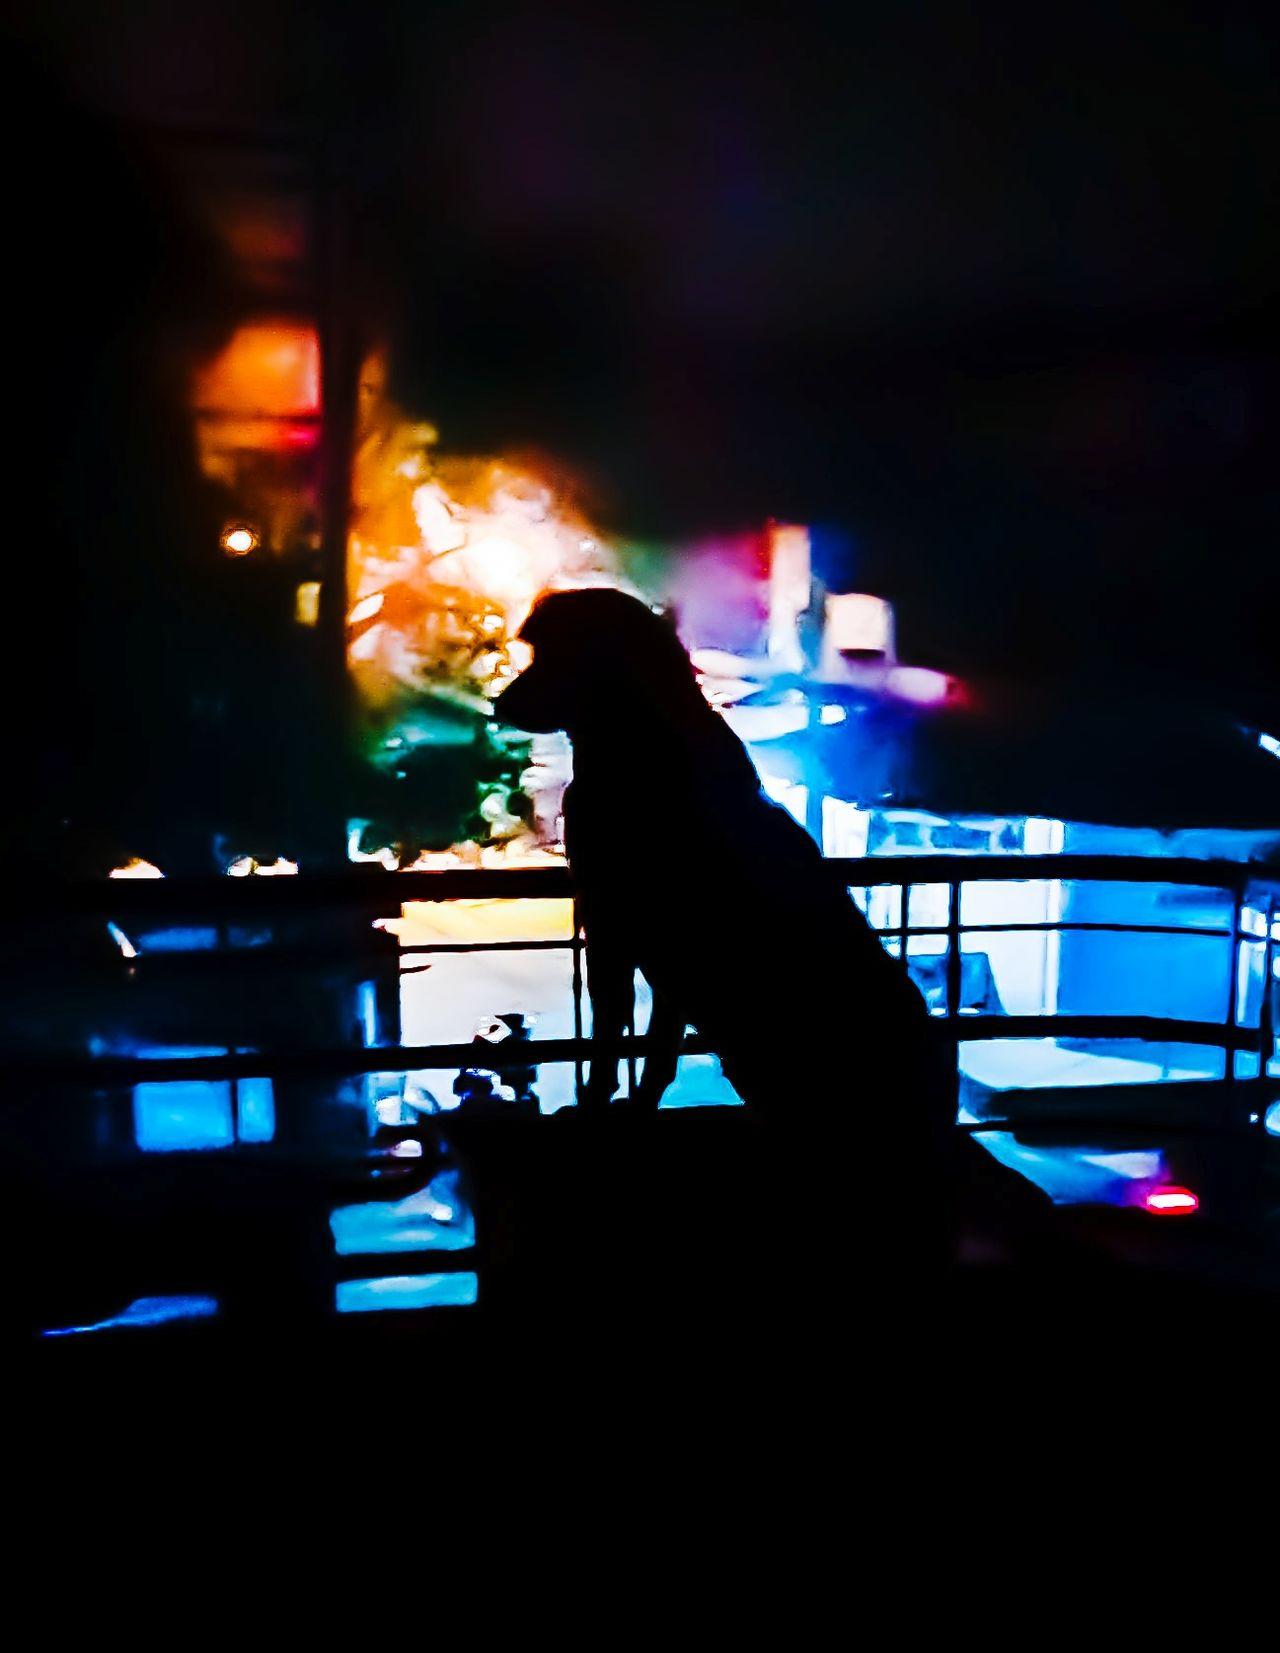 Night Illuminated Dog❤ Dog Animal Dark Figure DarkFigure Streetlight